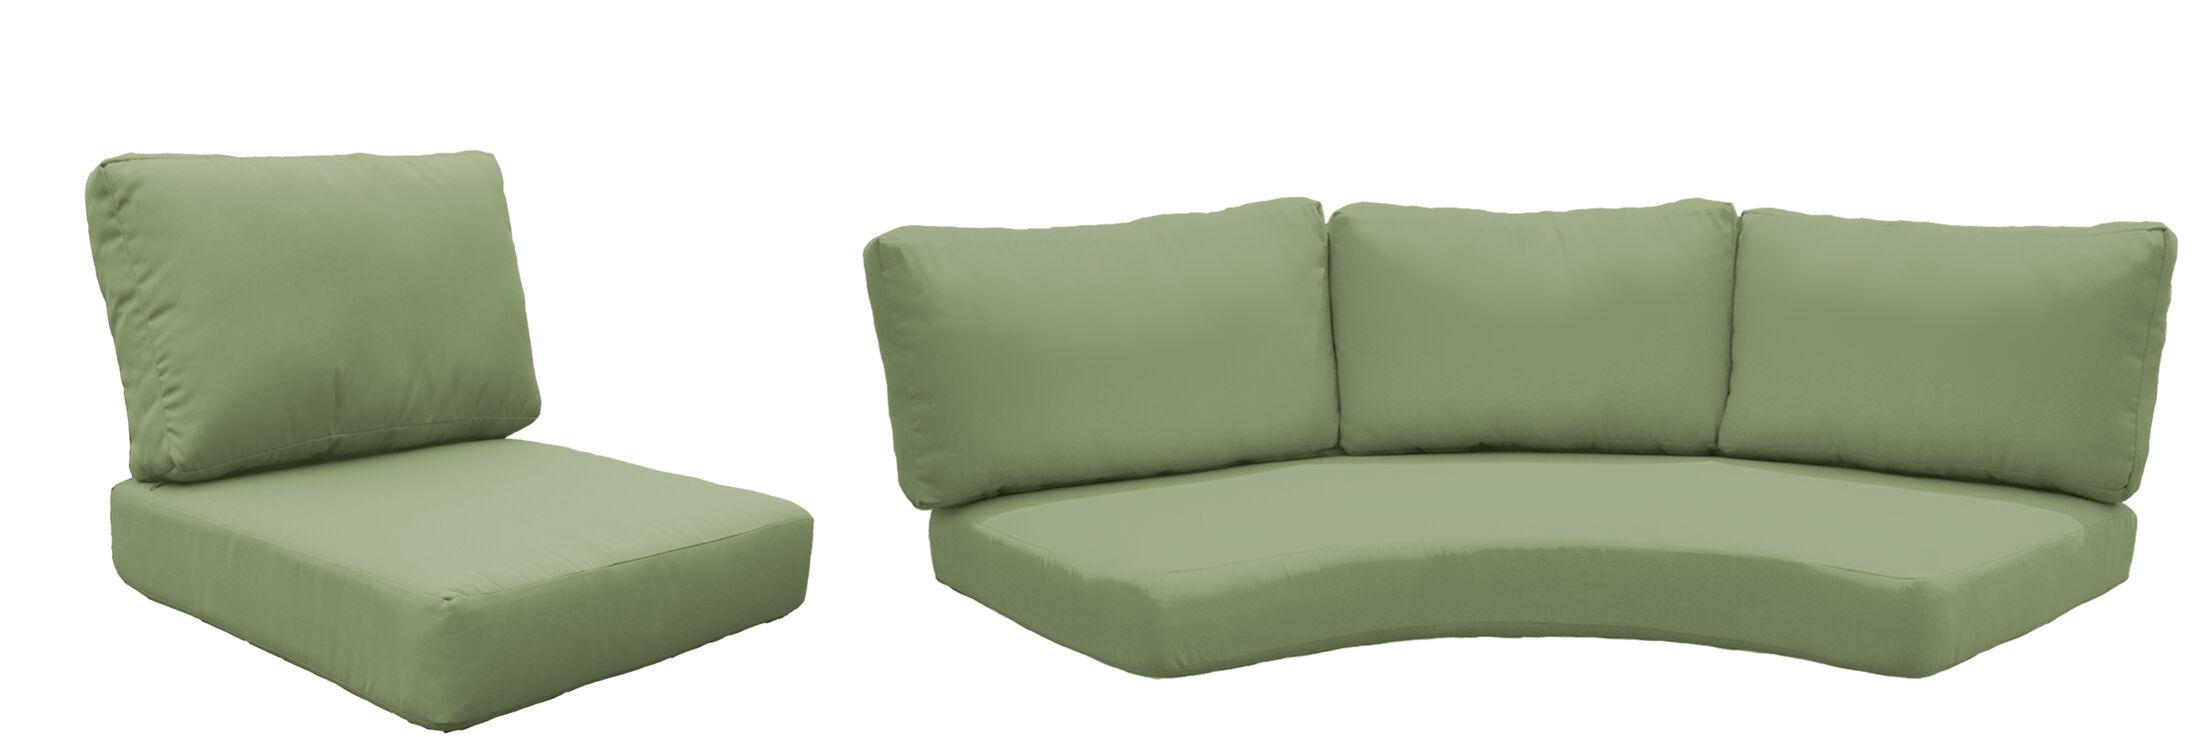 East Village 10 Piece Outdoor Cushion Set Fabric: Cilantro